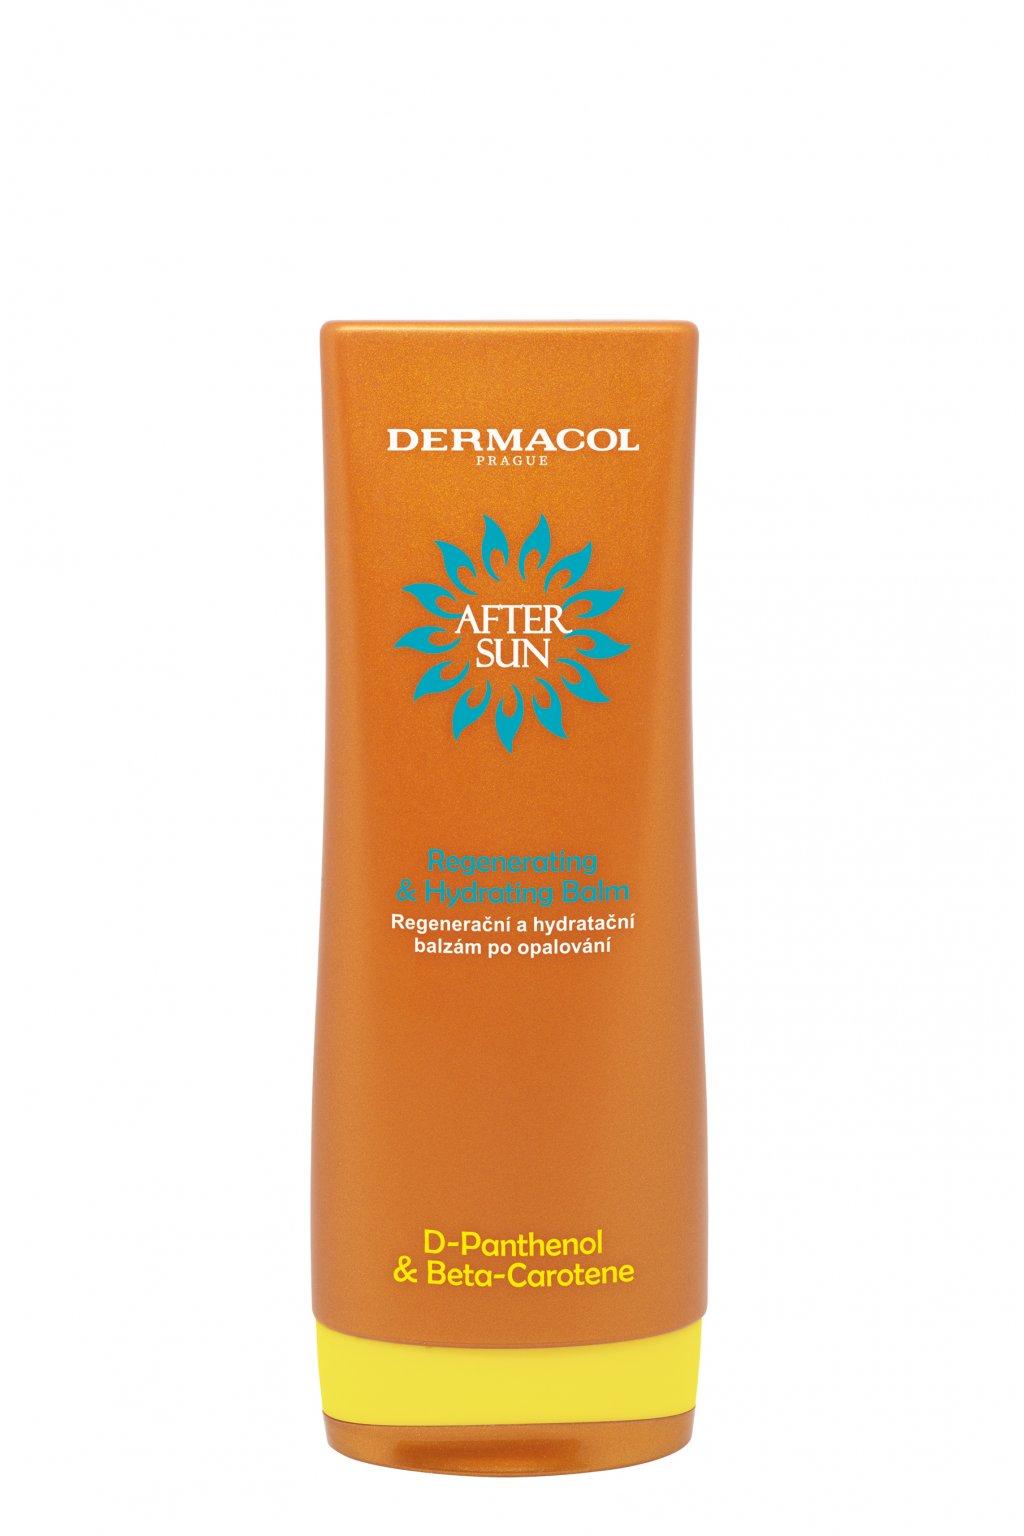 dermacol after sun chladivy balzam po opalovani 200 ml